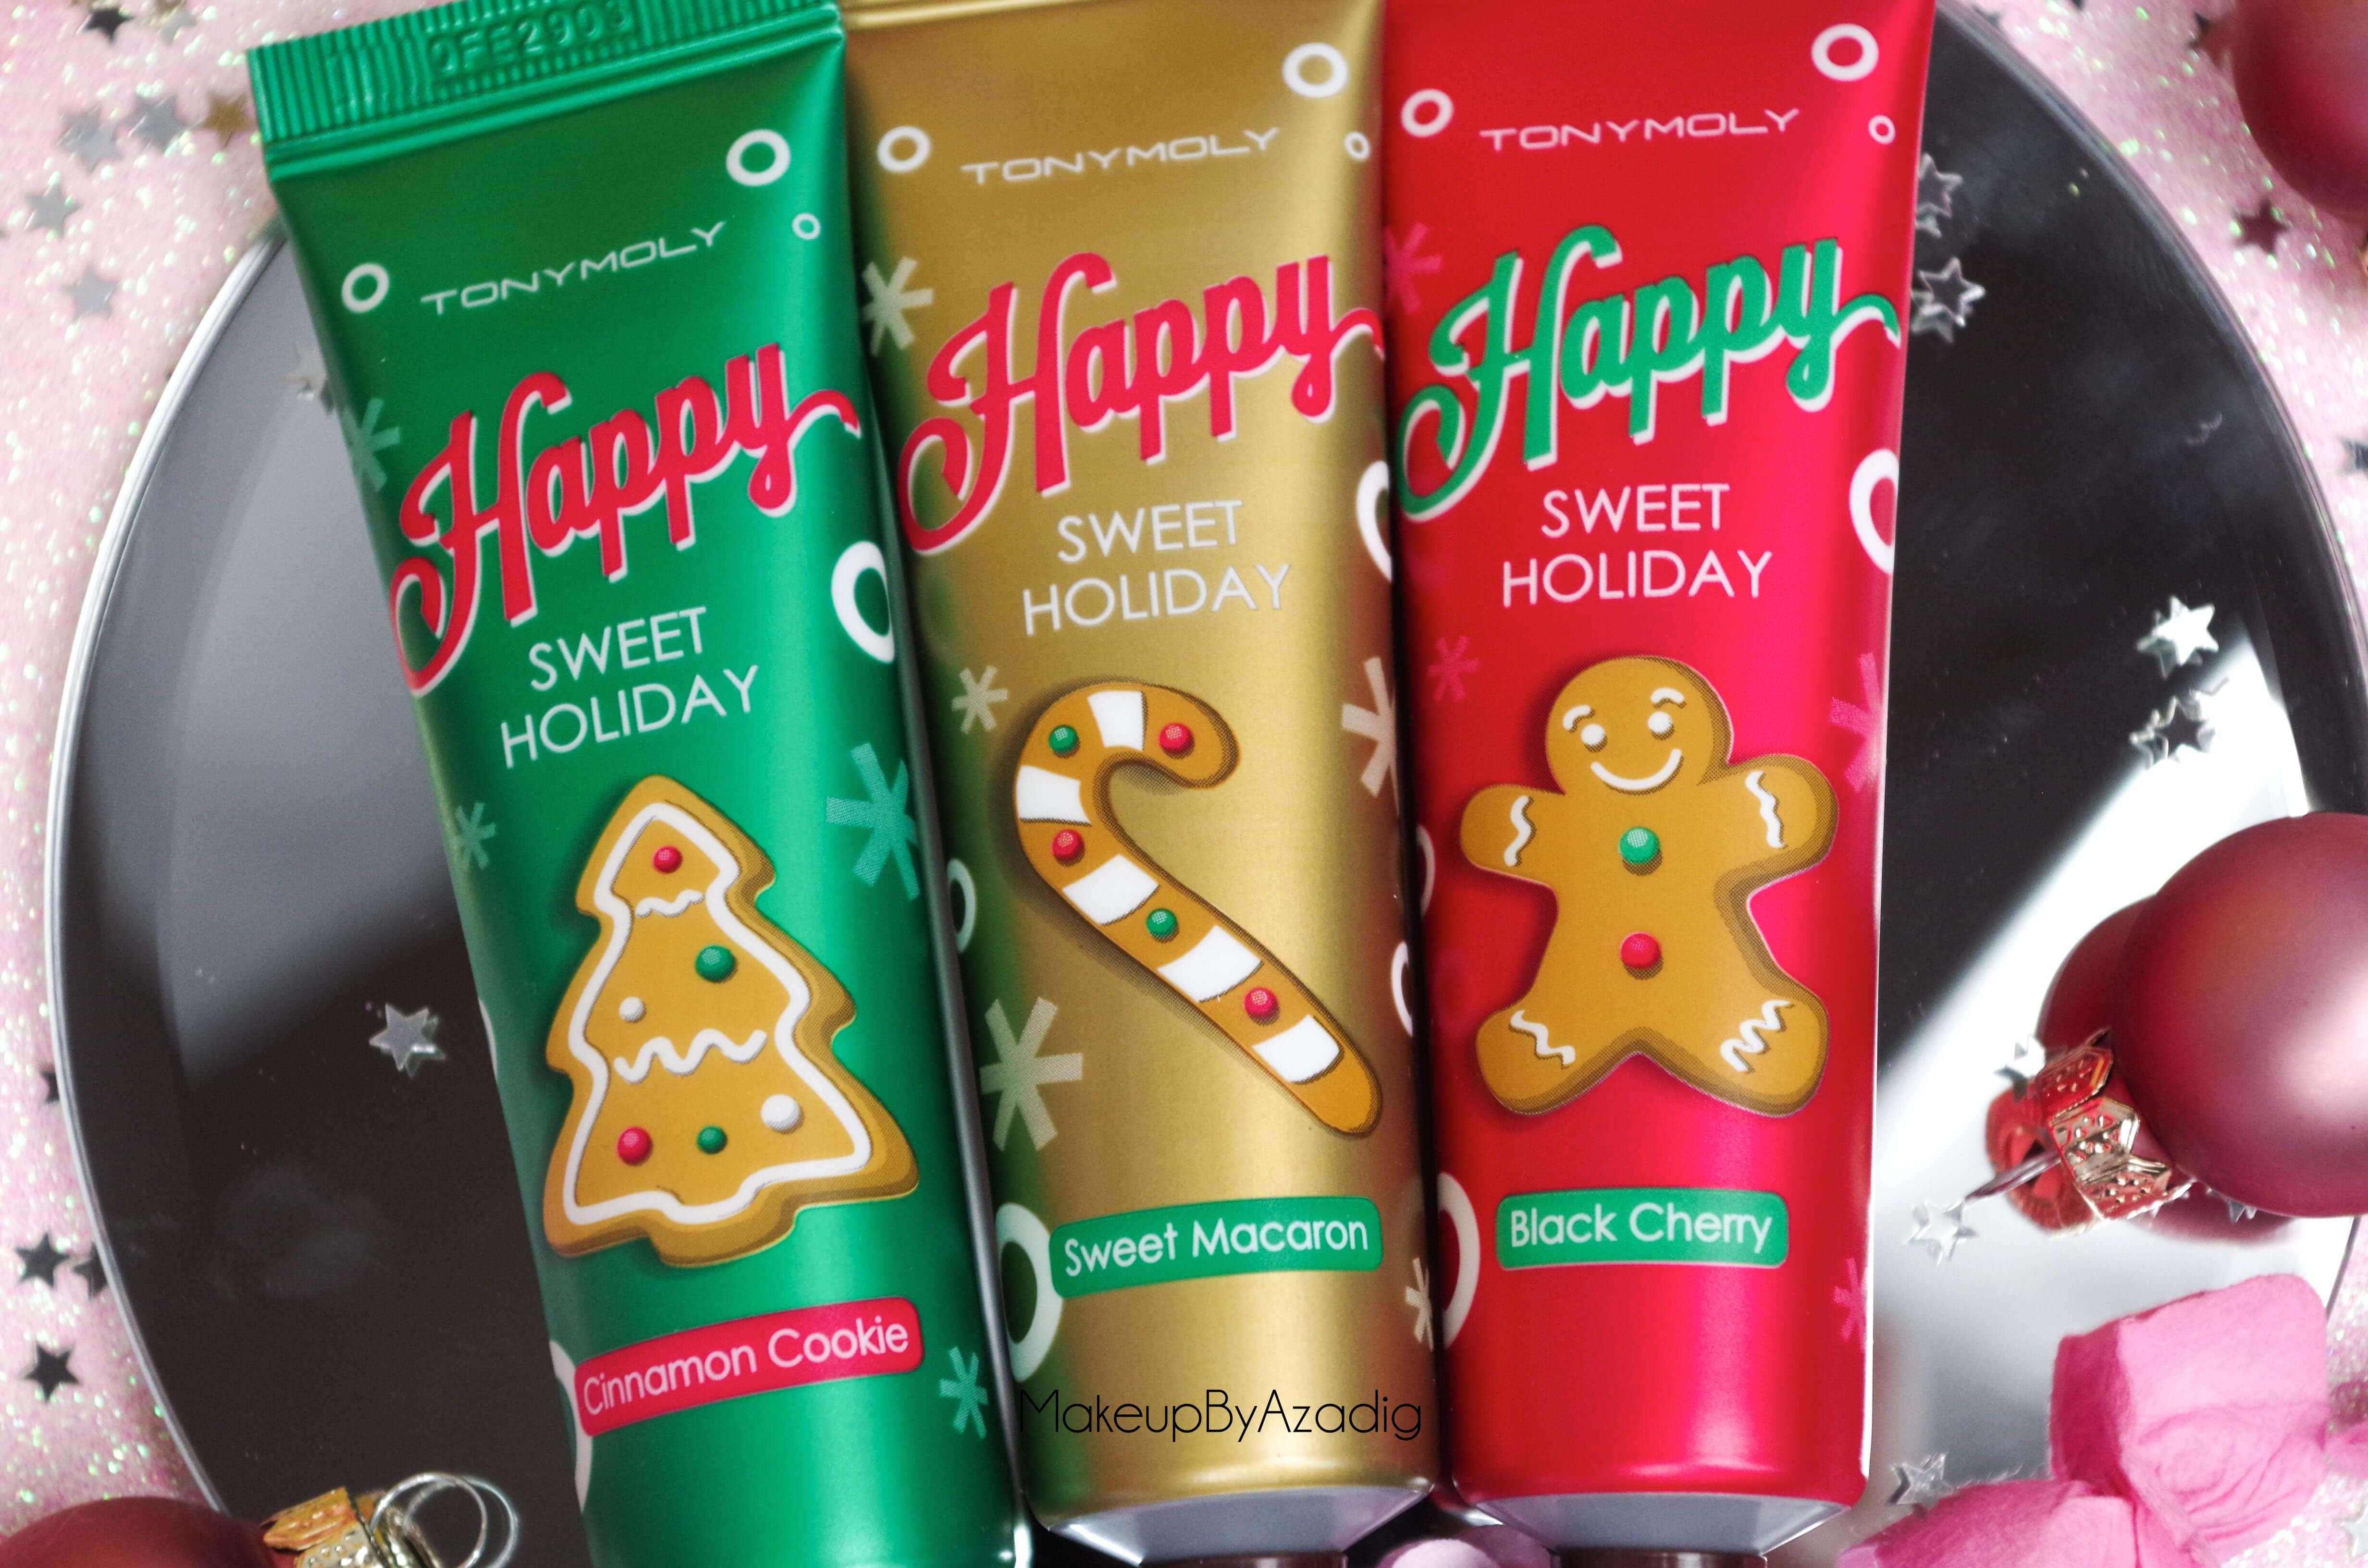 makeupbyazadig-tonymoly-sephora-paris-troyes-creme-mains-collection-noel-holiday-avis-revue-tibiscuit